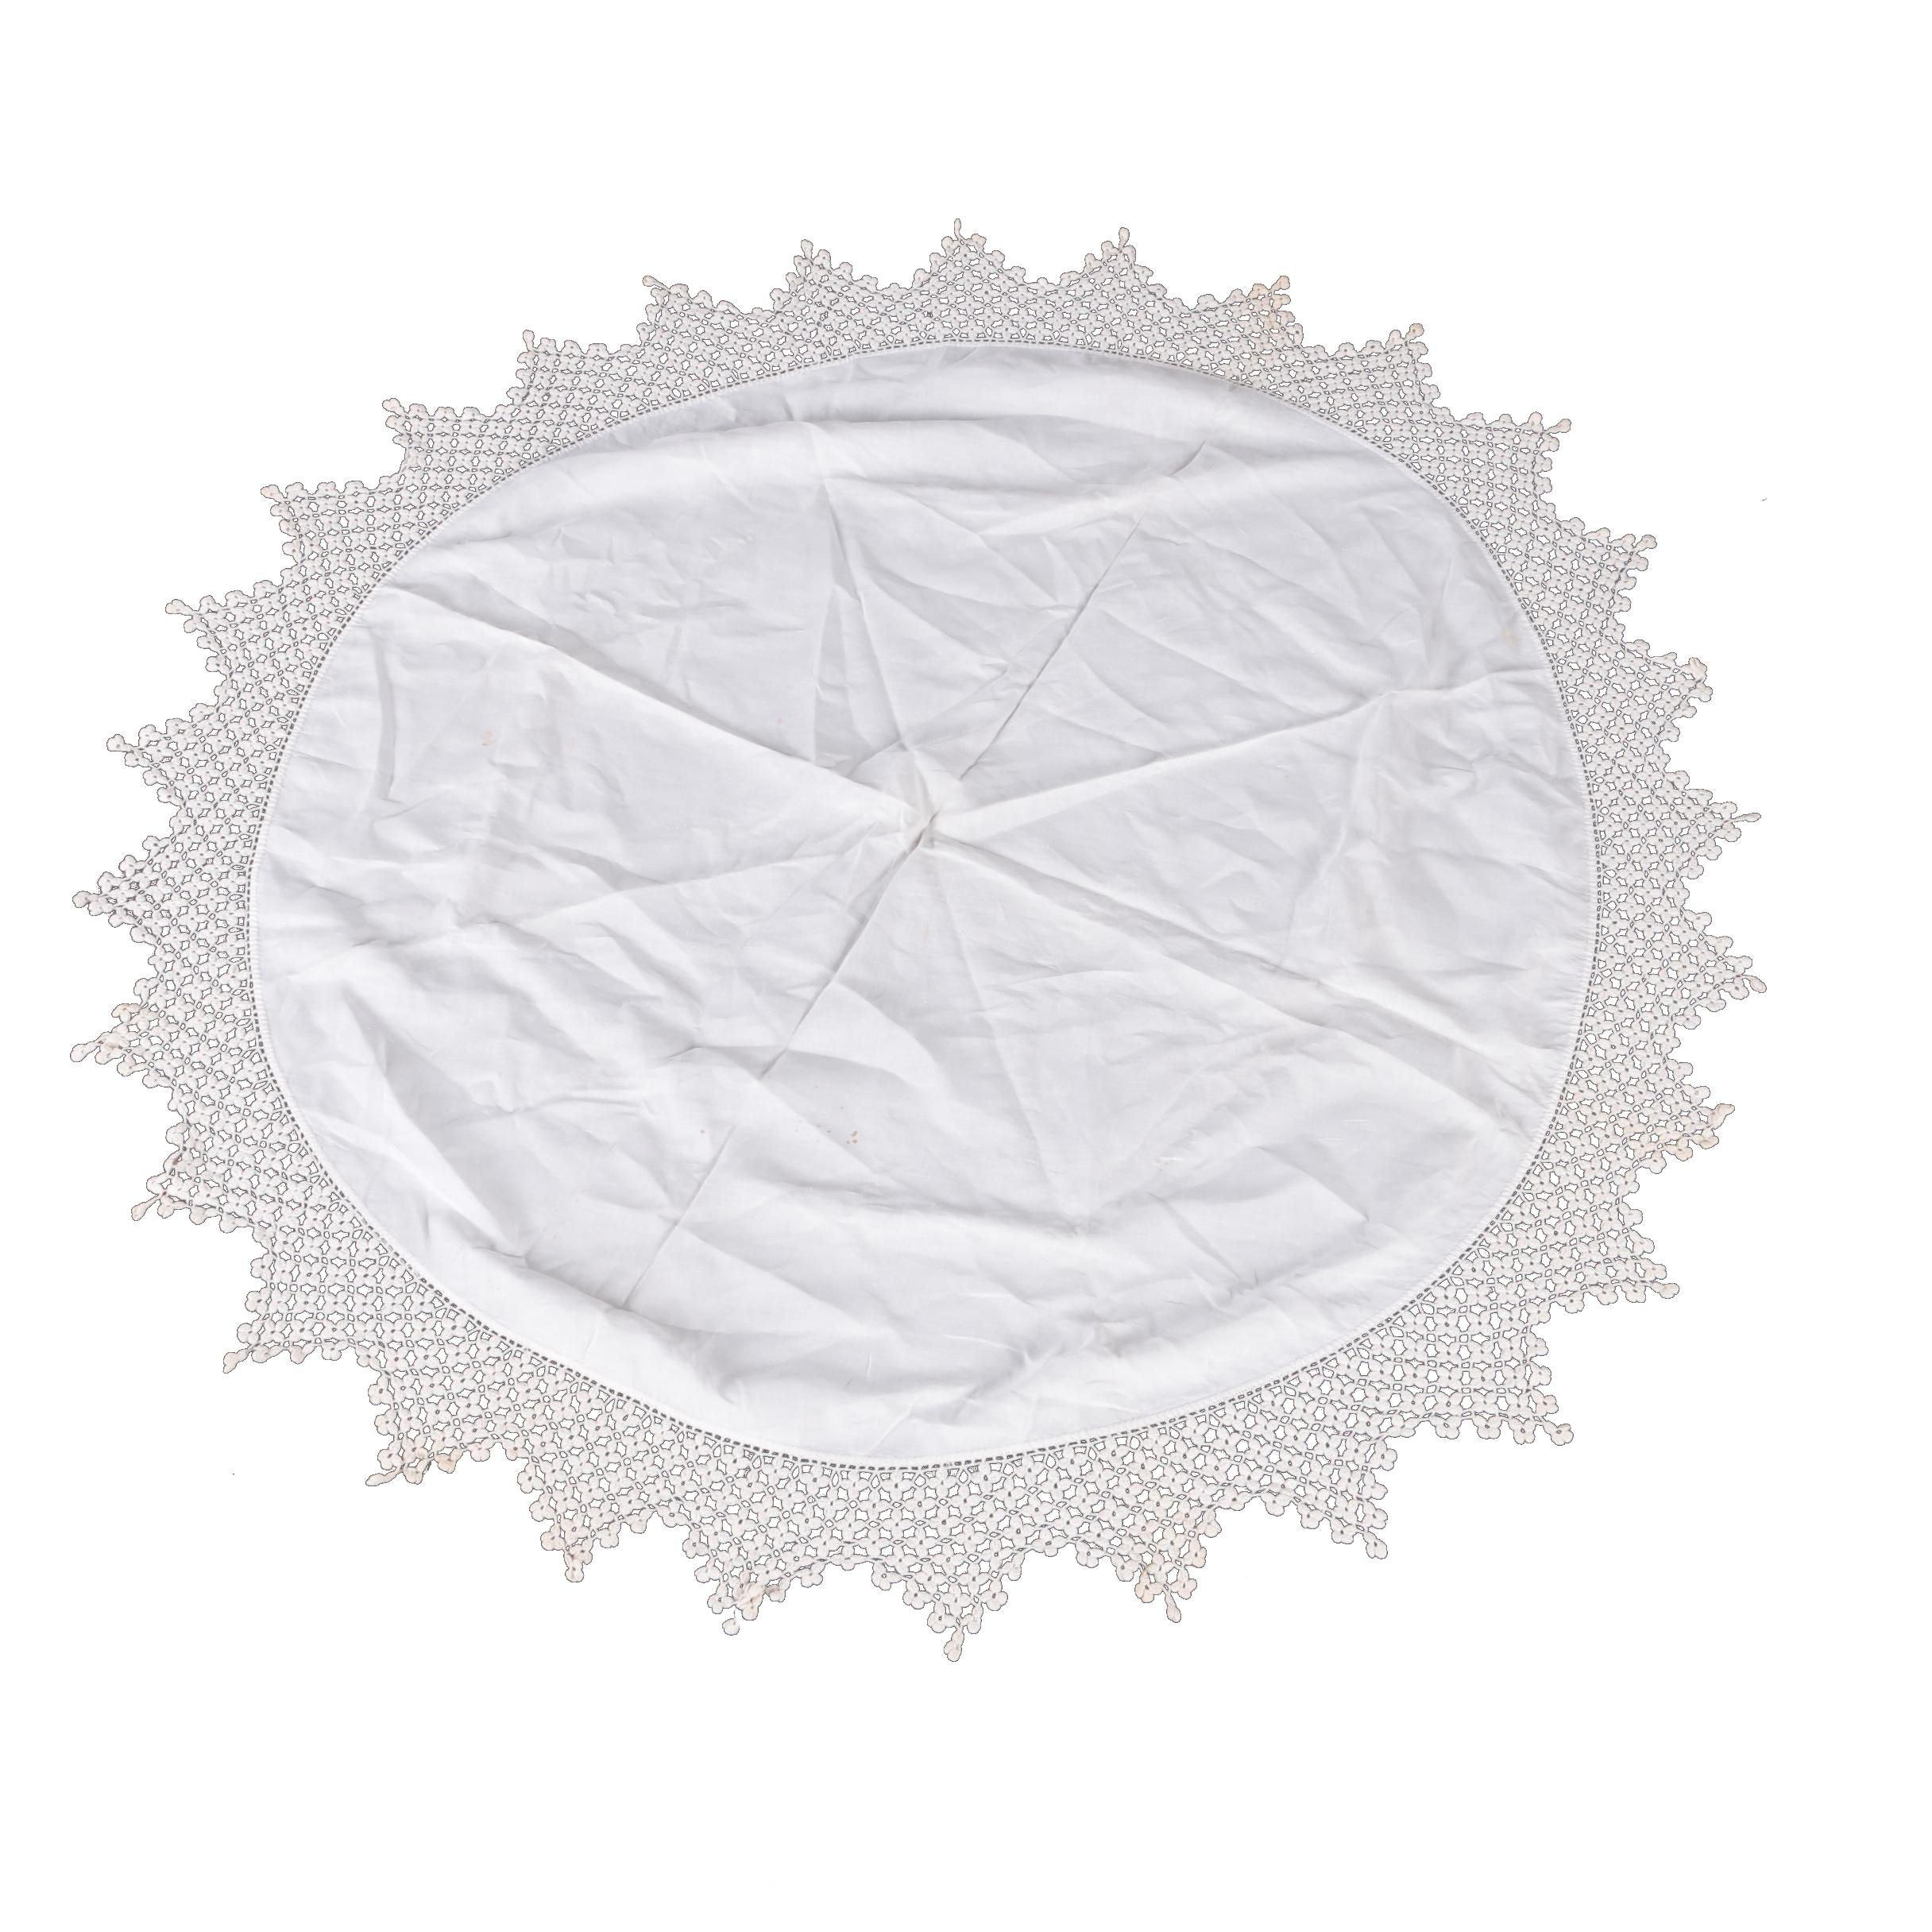 1940's Handmade Crocheted Tablecloth